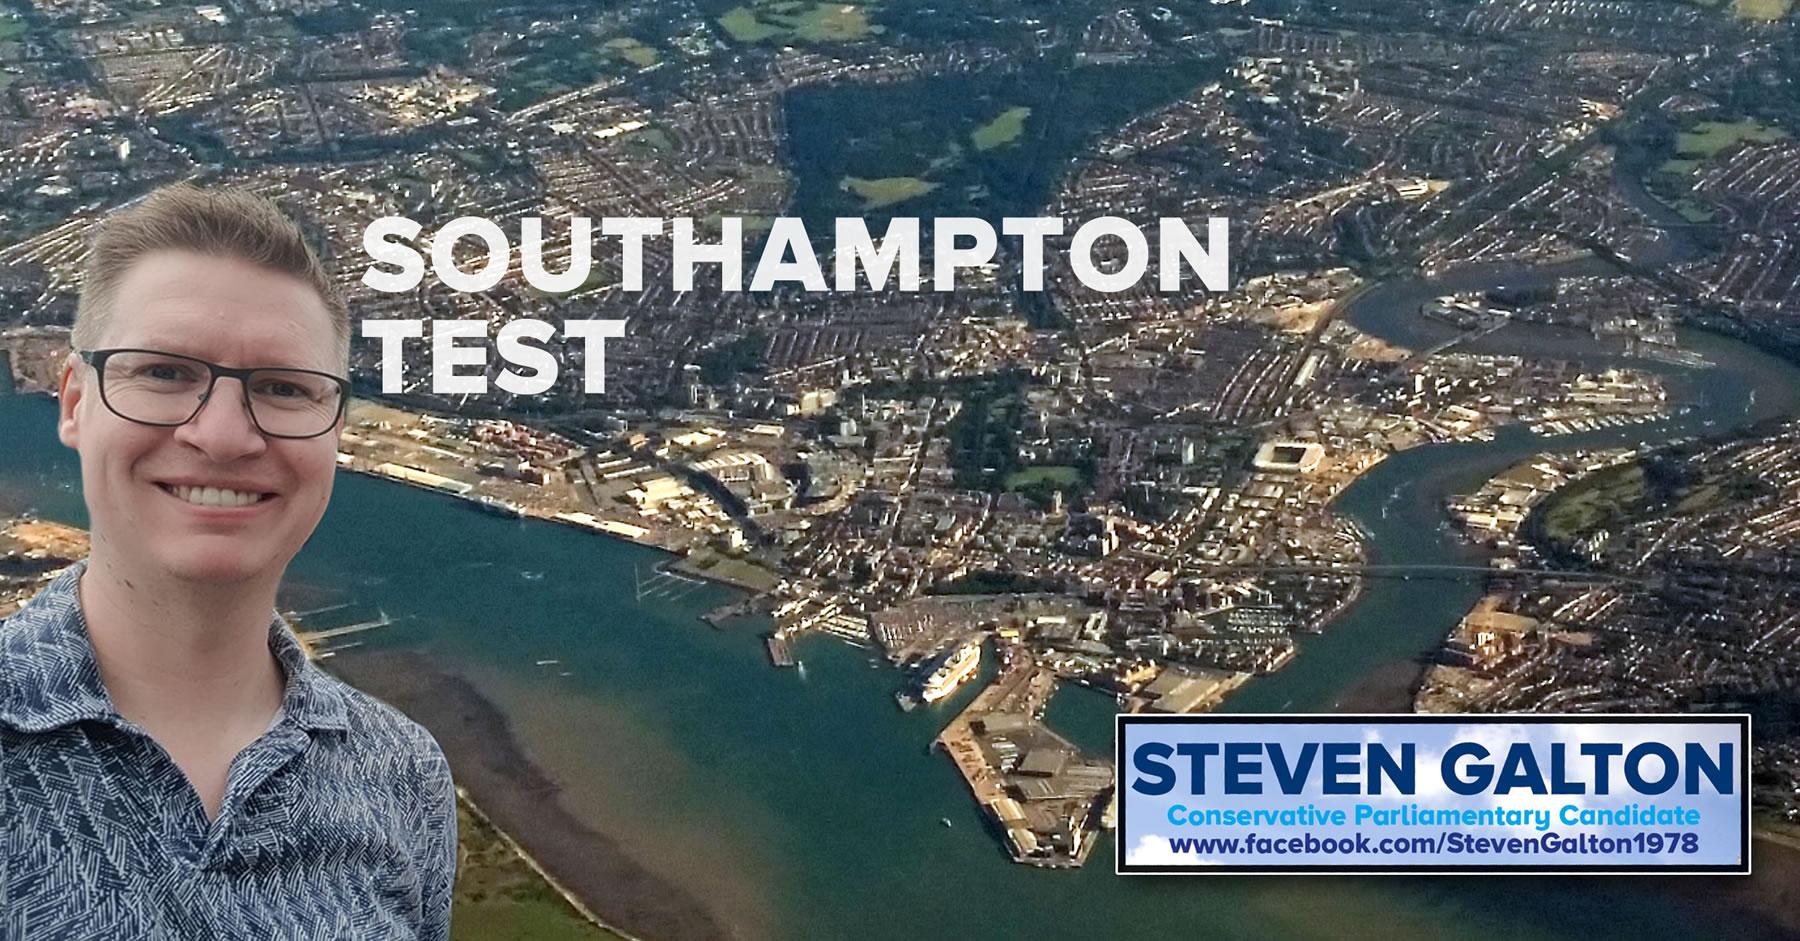 Steven Galton Southampton Test Conservative Parliamentary Candidate